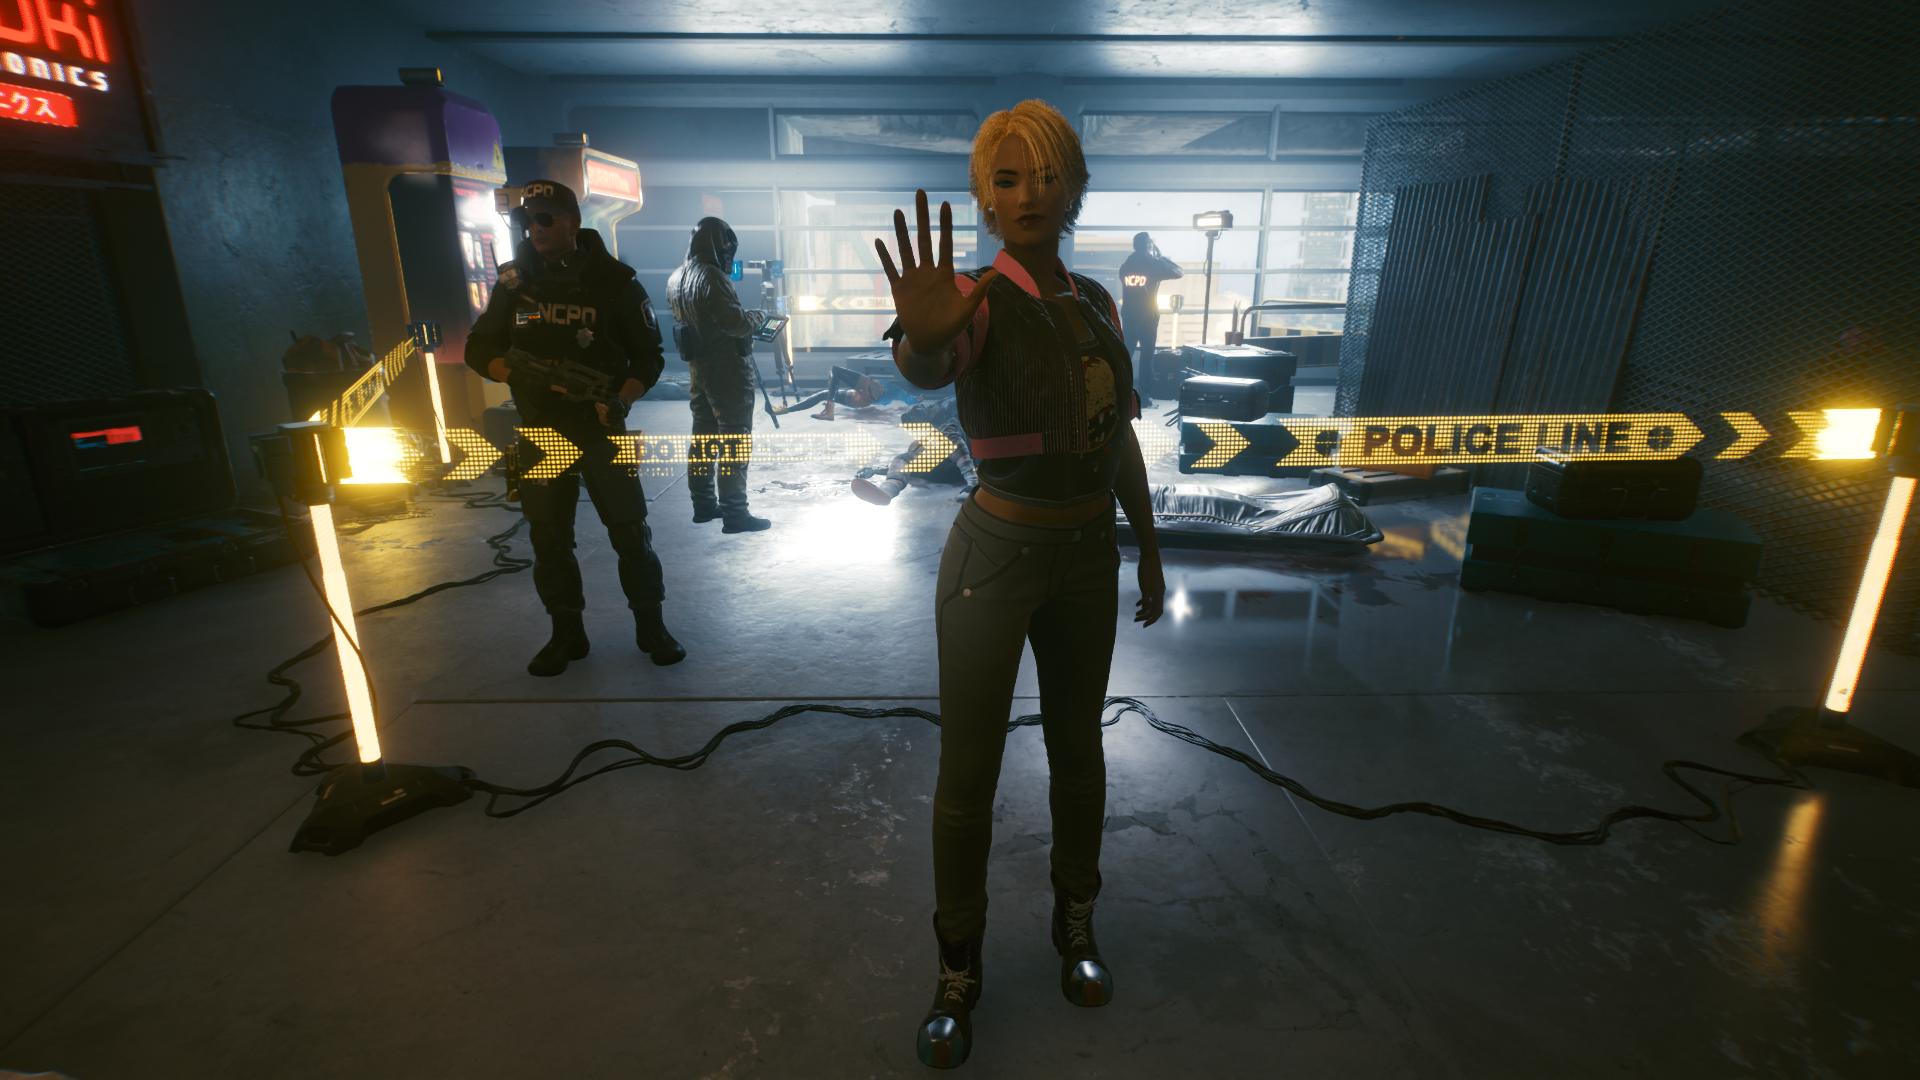 Сюда нельзя! - Cyberpunk 2077